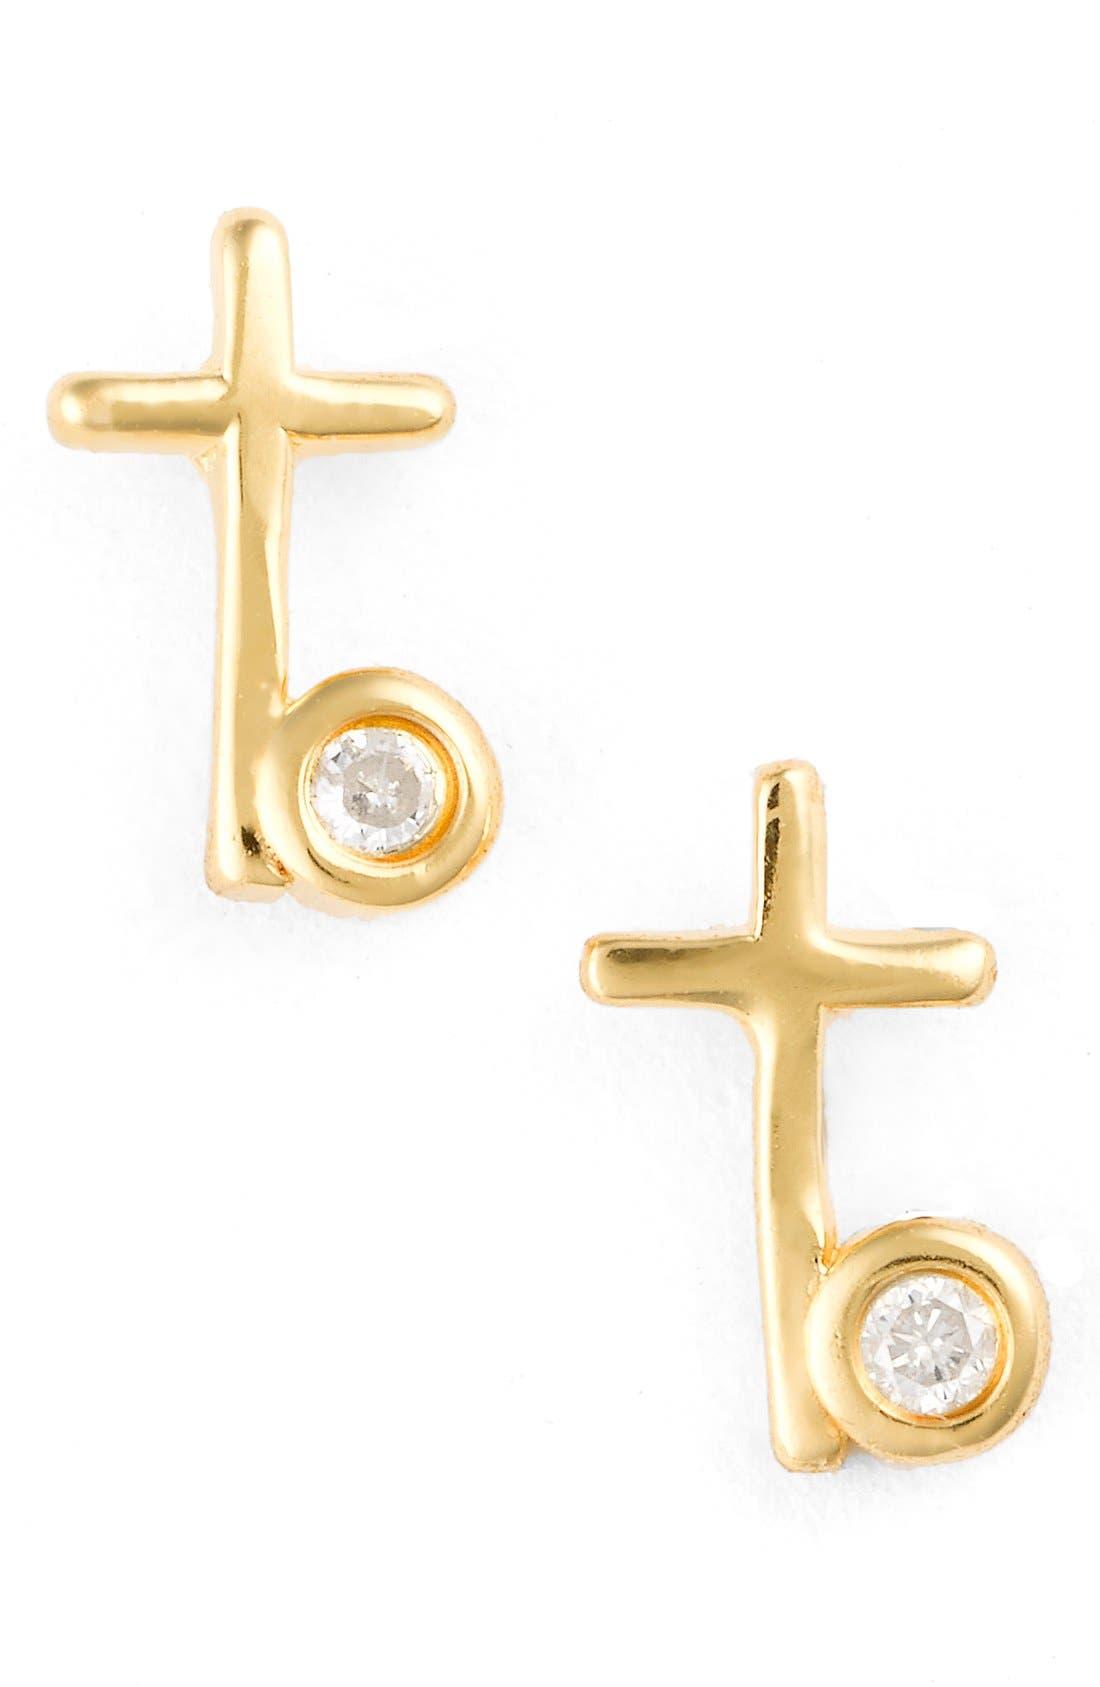 Alternate Image 1 Selected - Shy by SE Cross Stud Earrings